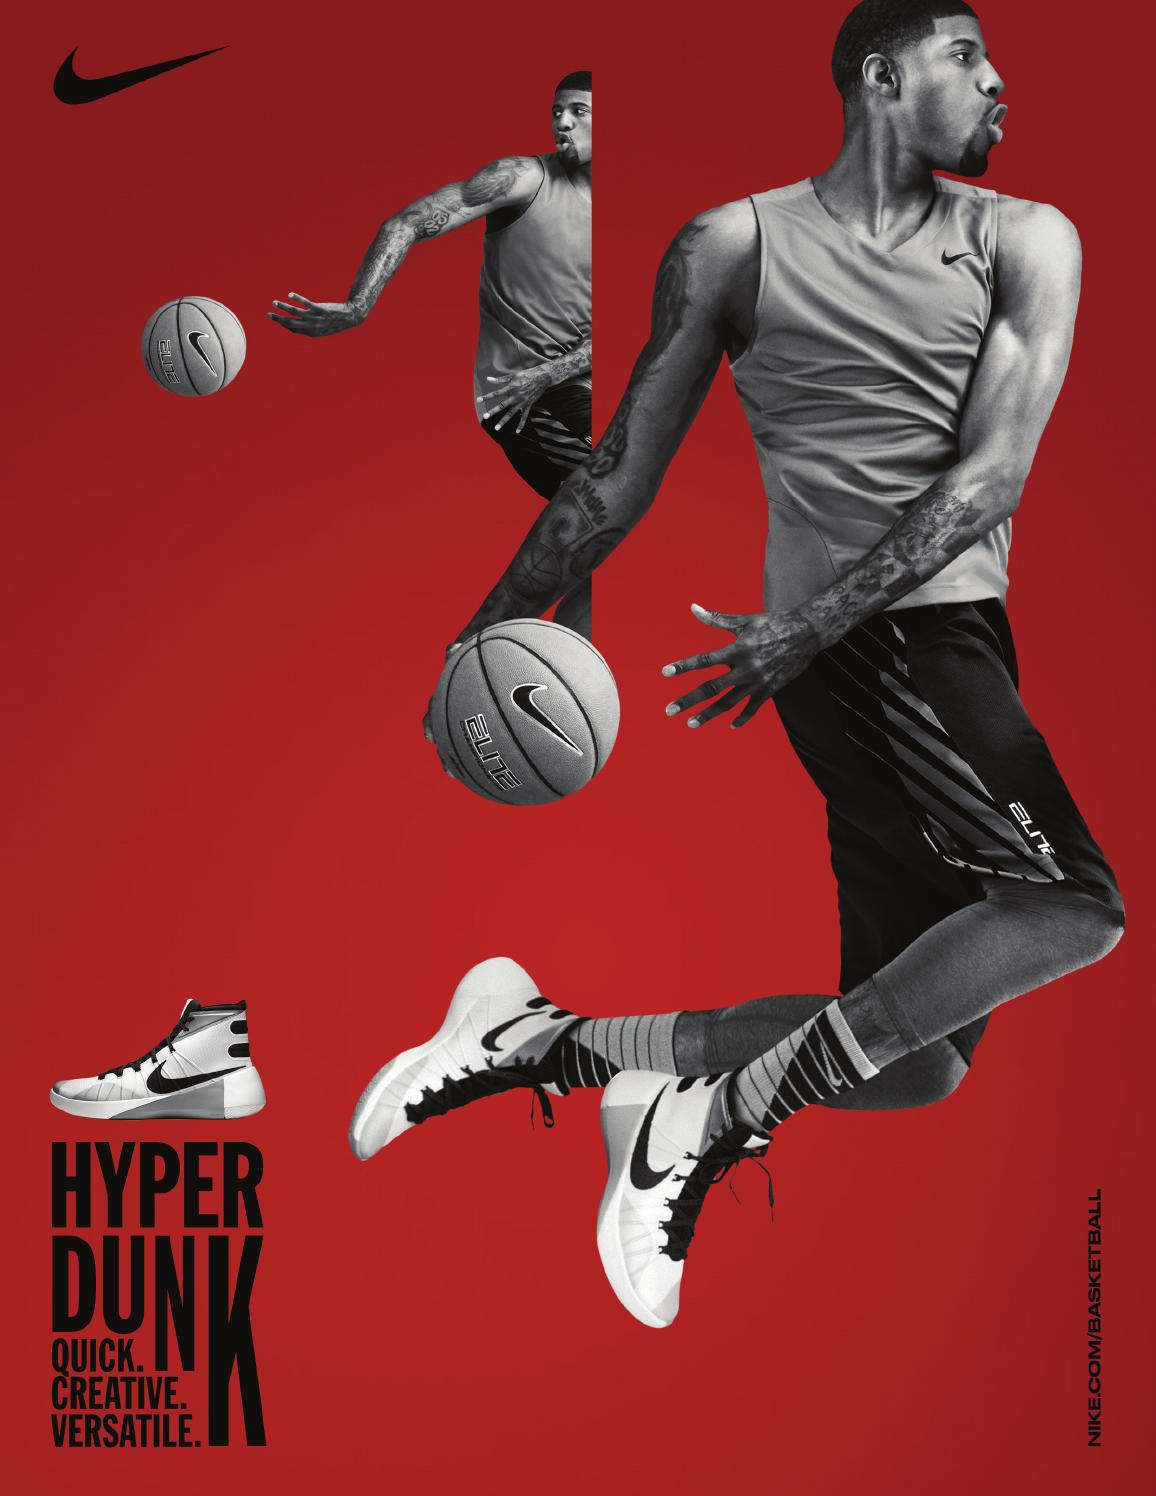 2015-16 UNCG Men s Basketball Digital Guide by UNCG Athletics - issuu d32cfc0a7a8